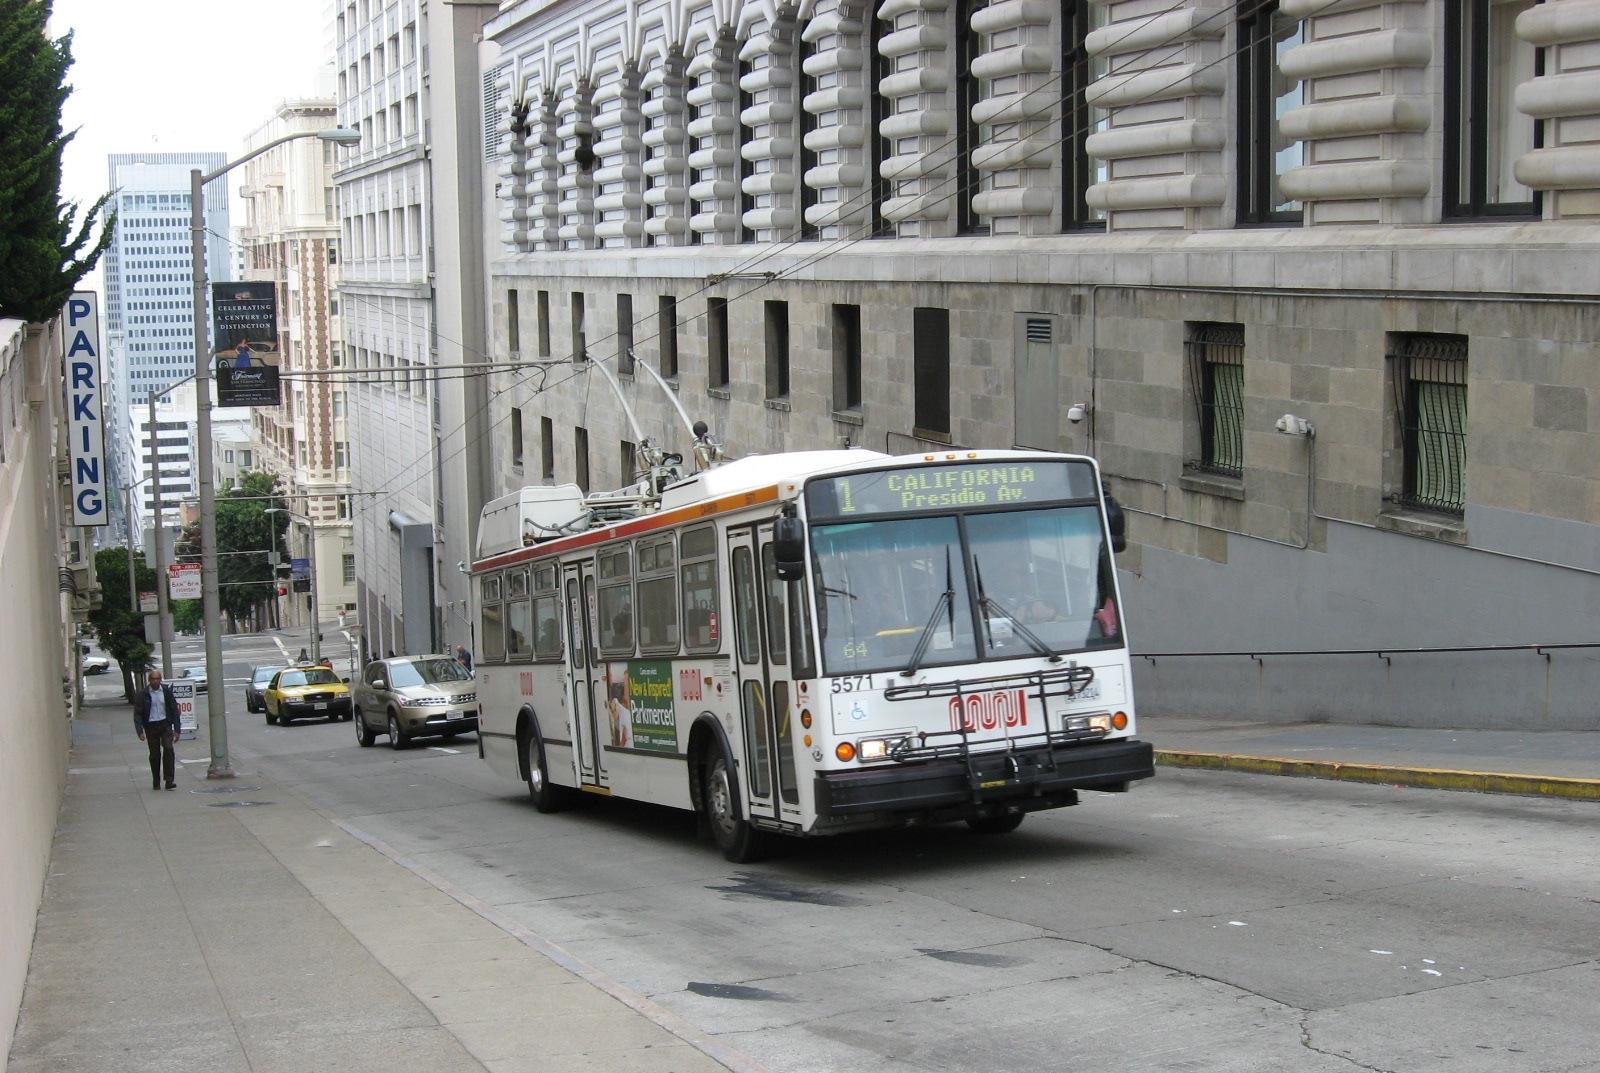 Trolleybuses in San Francisco Wikipedia